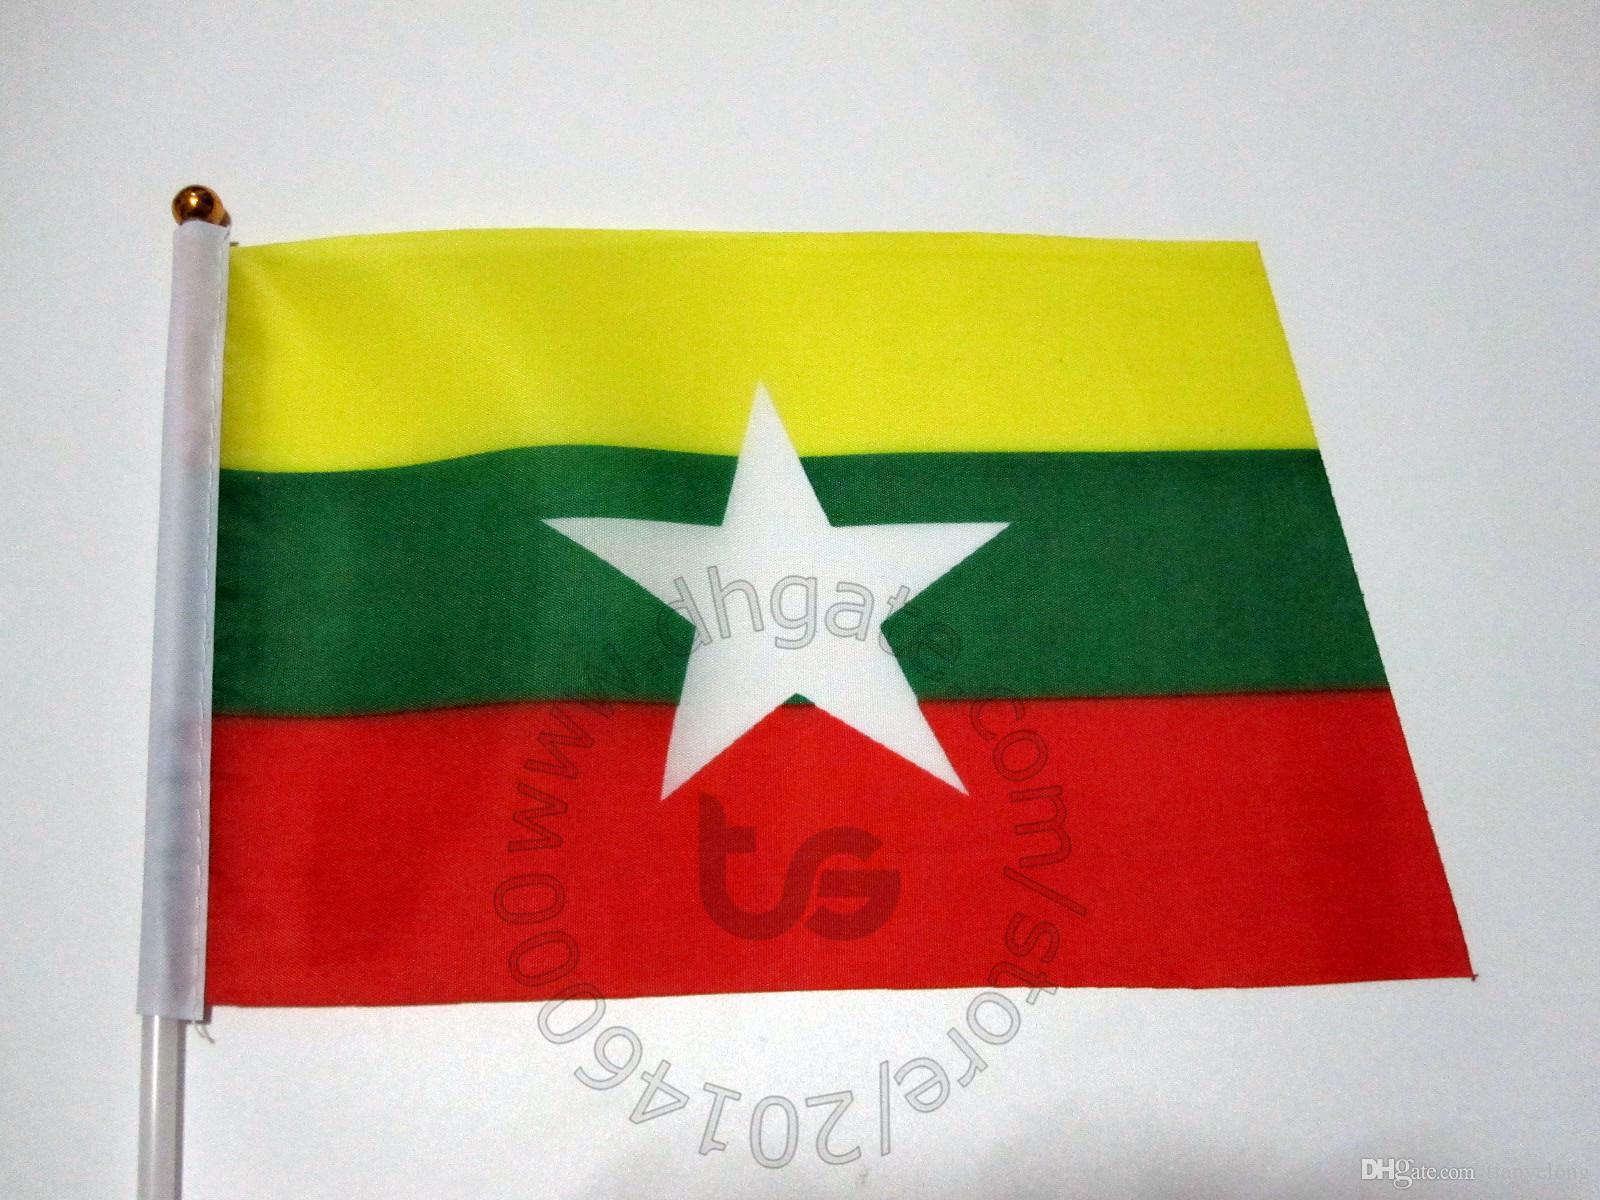 Мьянма Бирма флаг баннер 10 шт./Лот 14x21cm флаг 100% полиэстер флаги с пластиковыми флагштоками для украшения торжества Мьянма Бирма